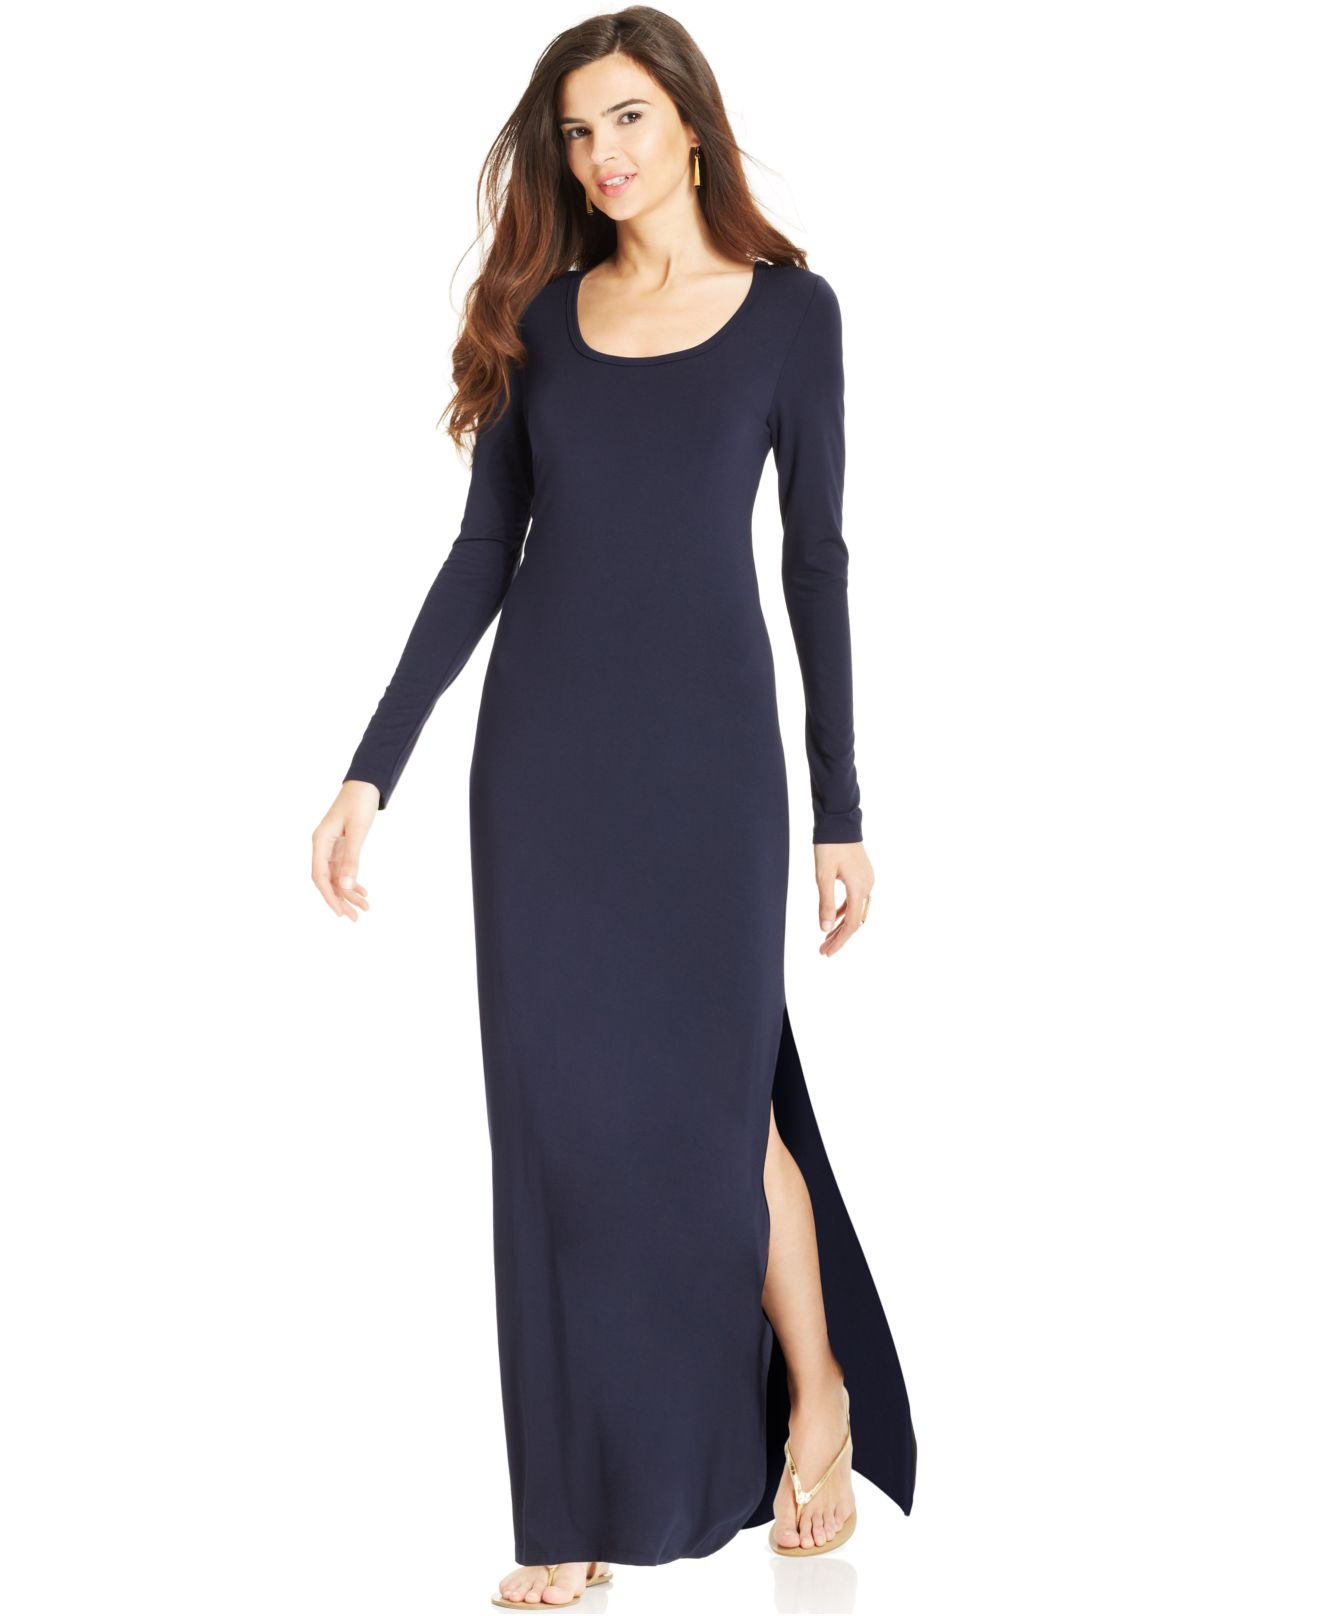 Karen kane maxi dress sale